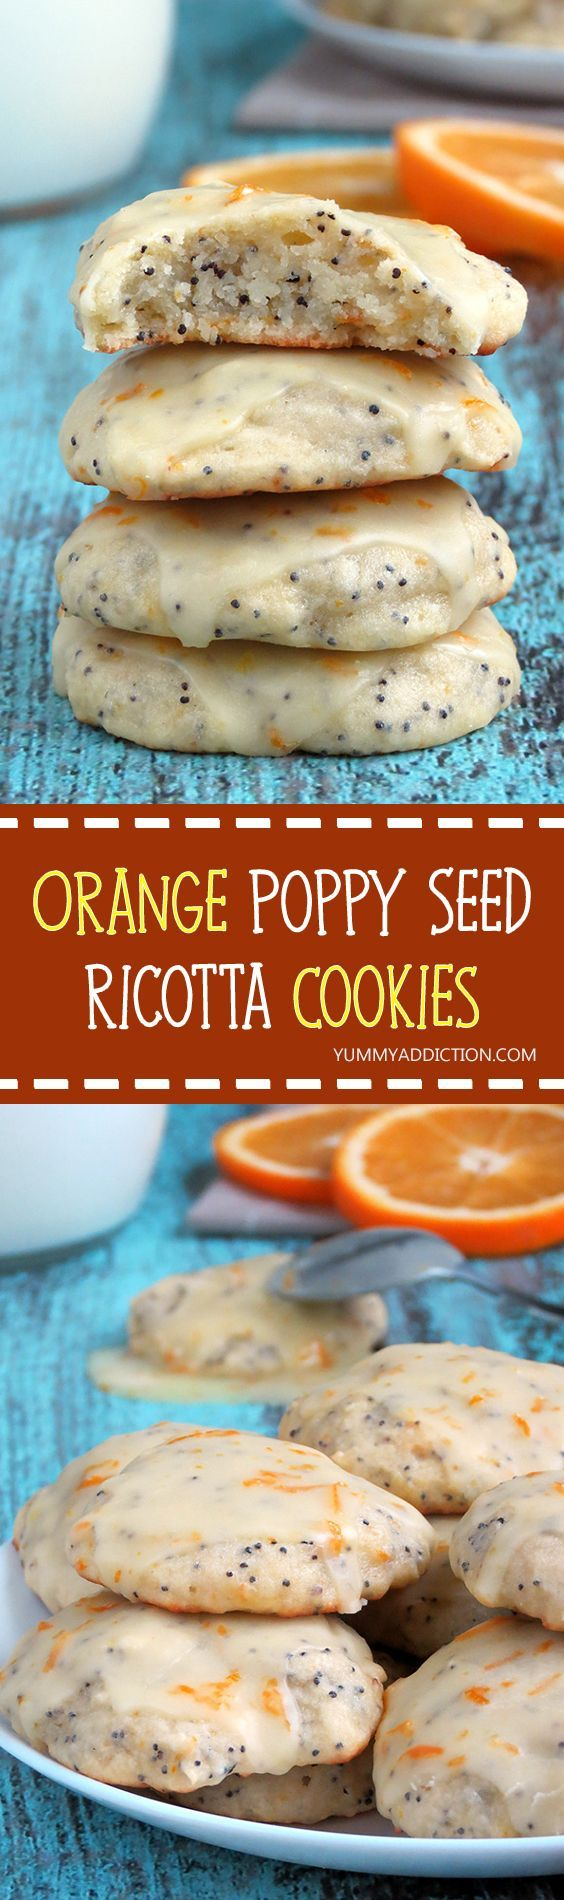 ... cookies and more ricotta cookies poppies cookies orange vanilla seeds